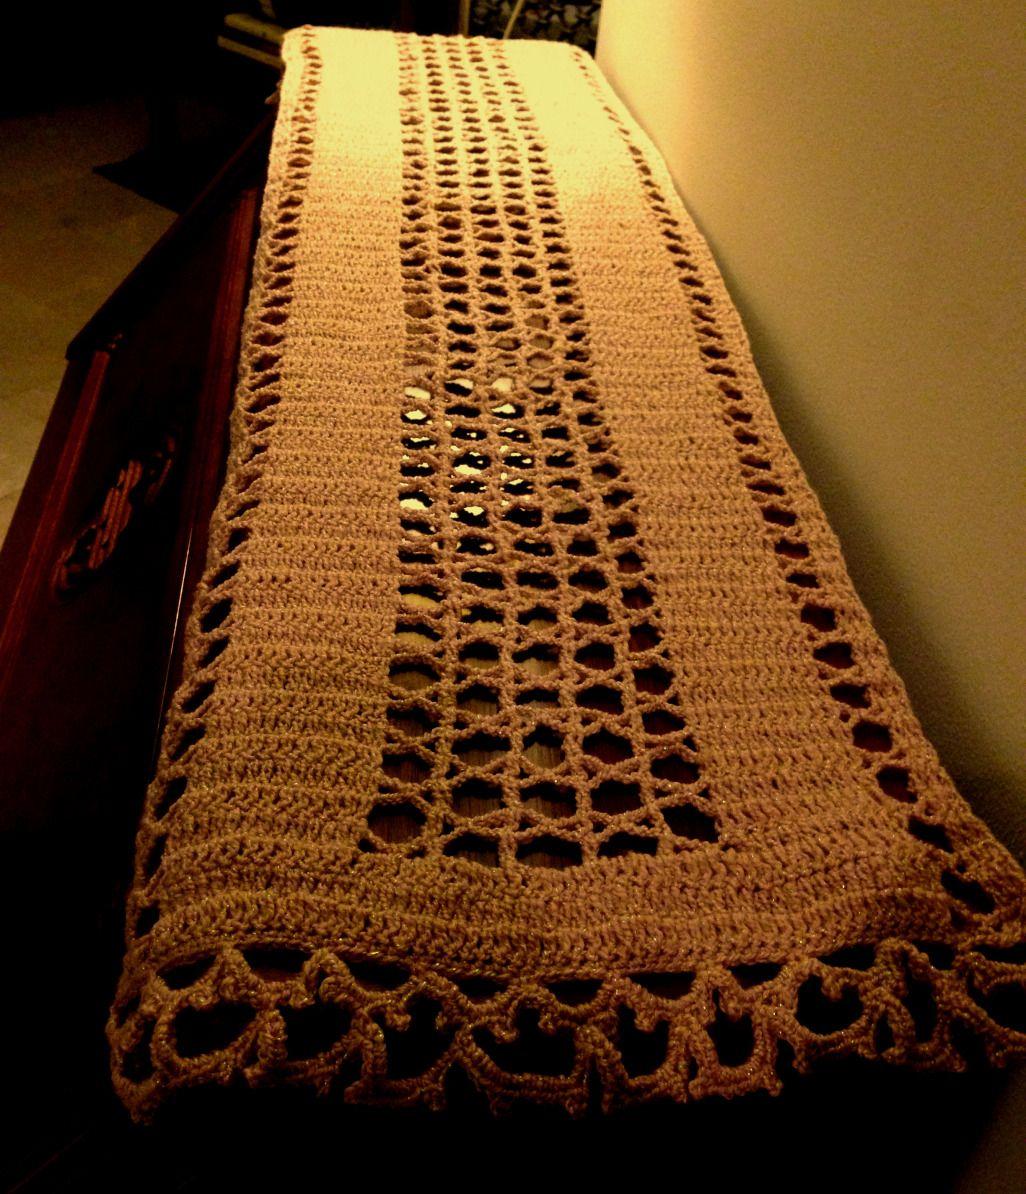 Crochet Table Runner (Free Pattern) | Free pattern, Crochet and Patterns